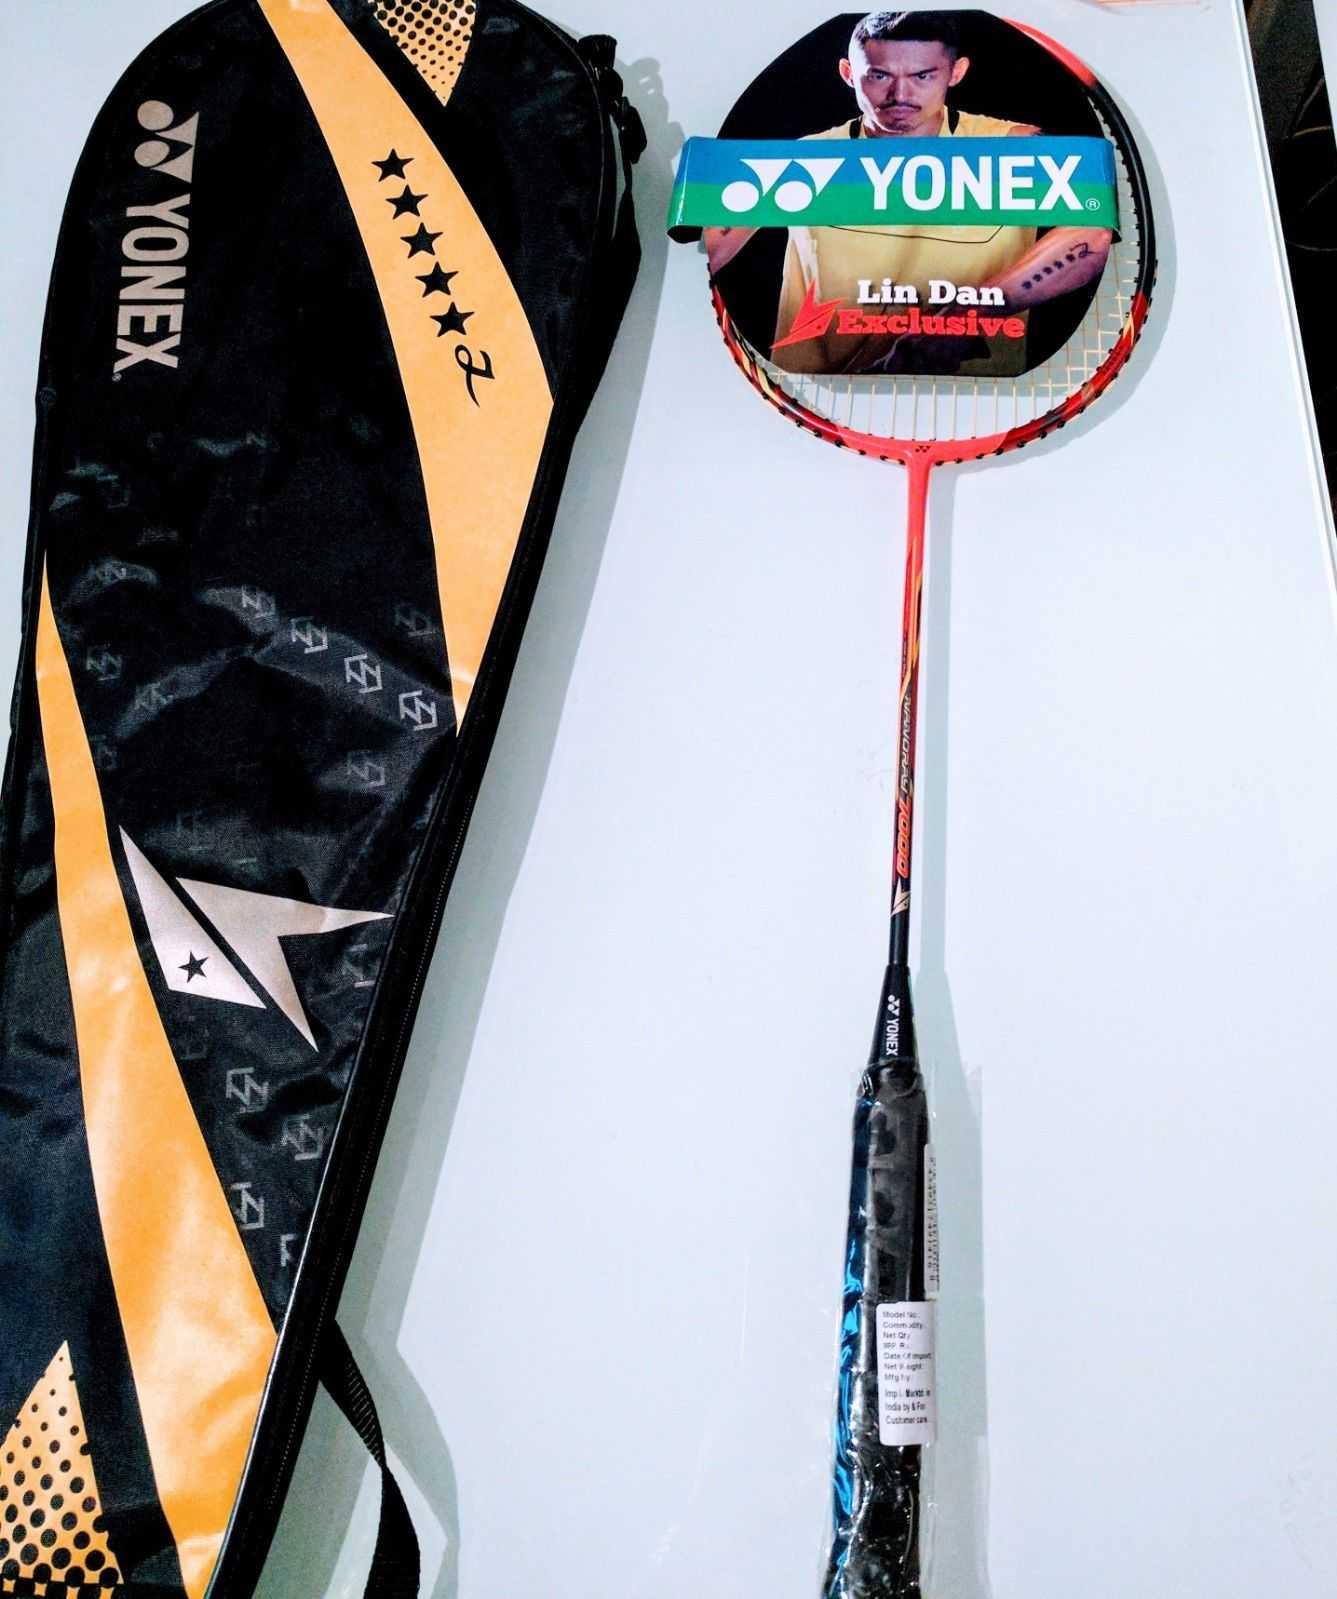 Yonex Nanoray 7000 Badminton Racket - Lin Dan Edition